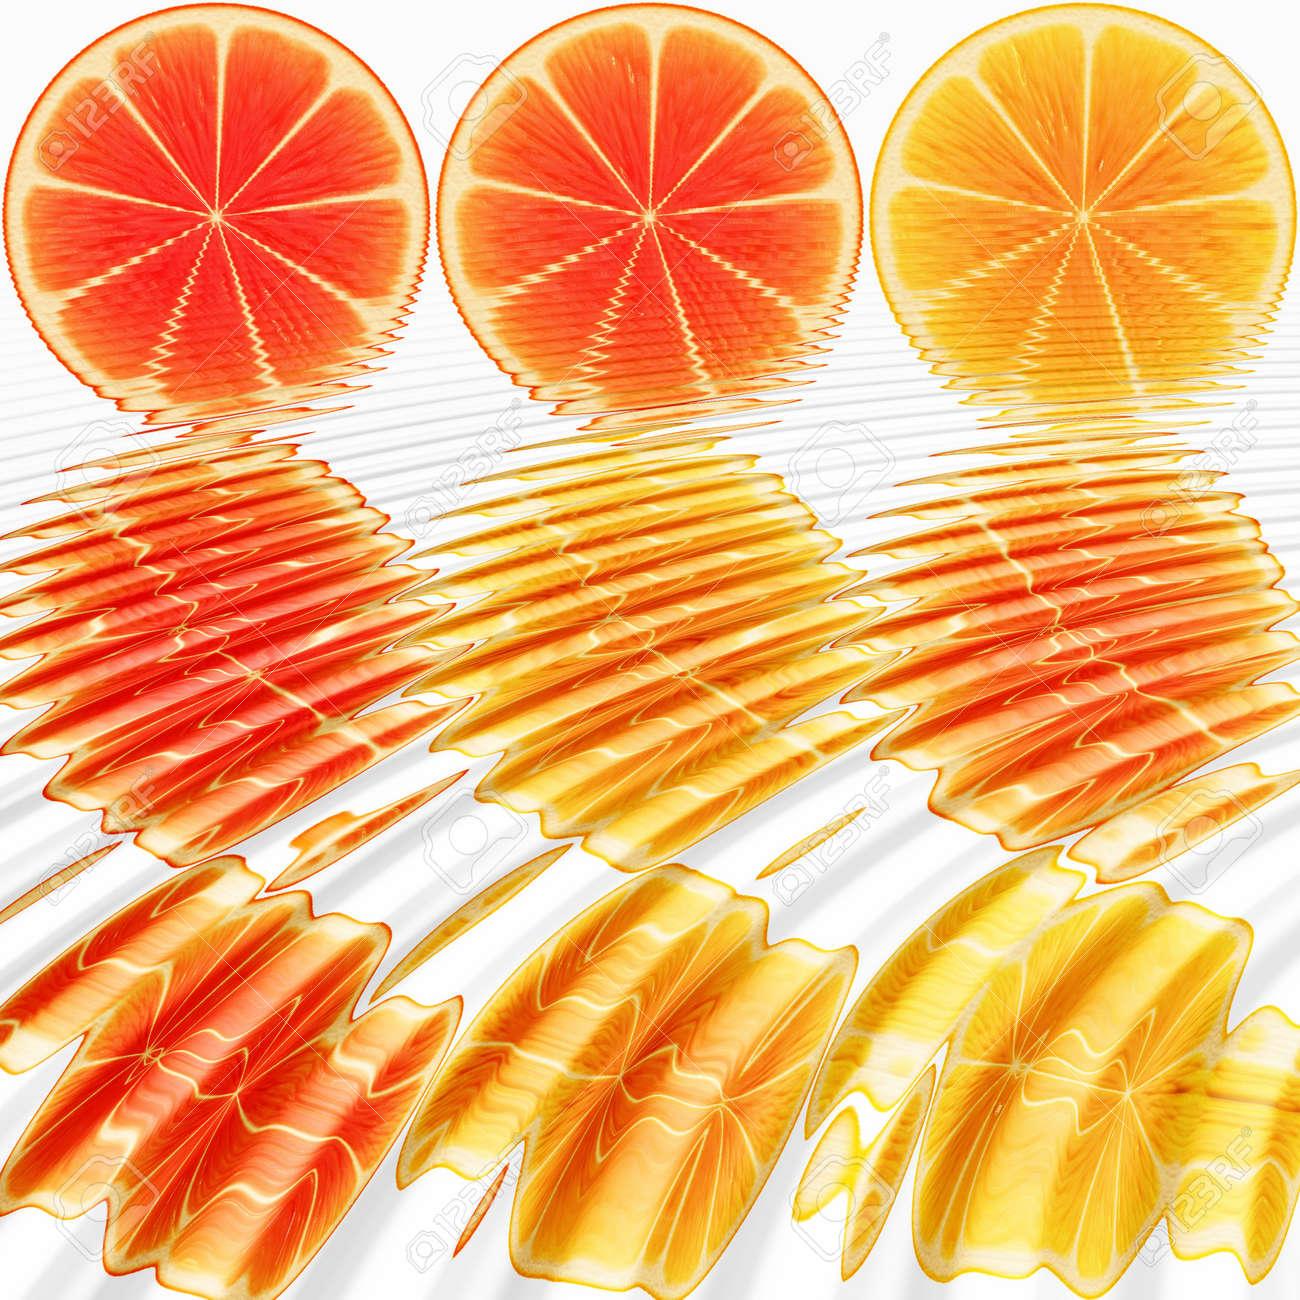 nine orange slices, submerged in water Stock Photo - 3808025